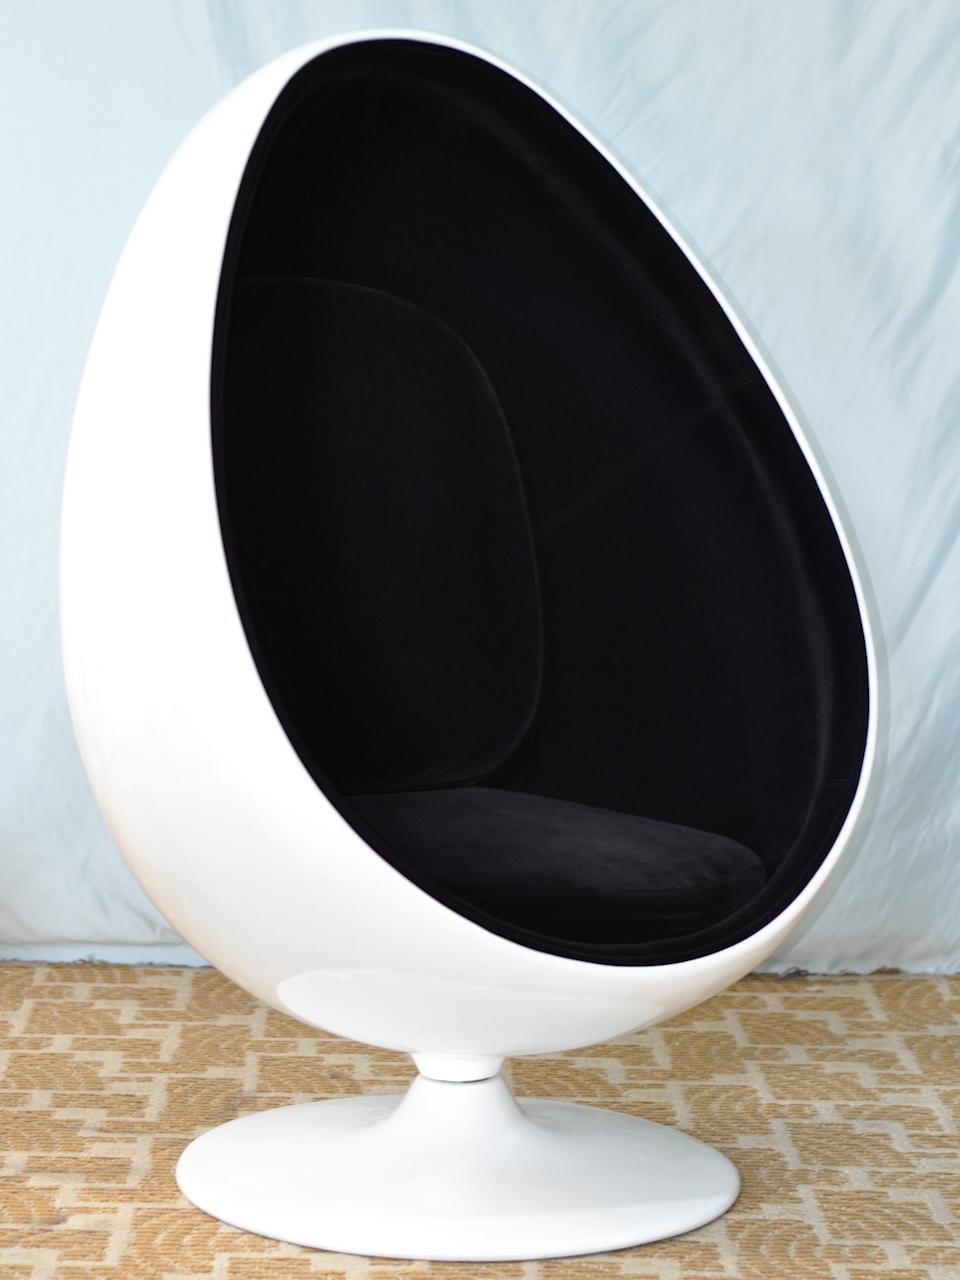 High quality fiberglass shaped egg chair NL2675